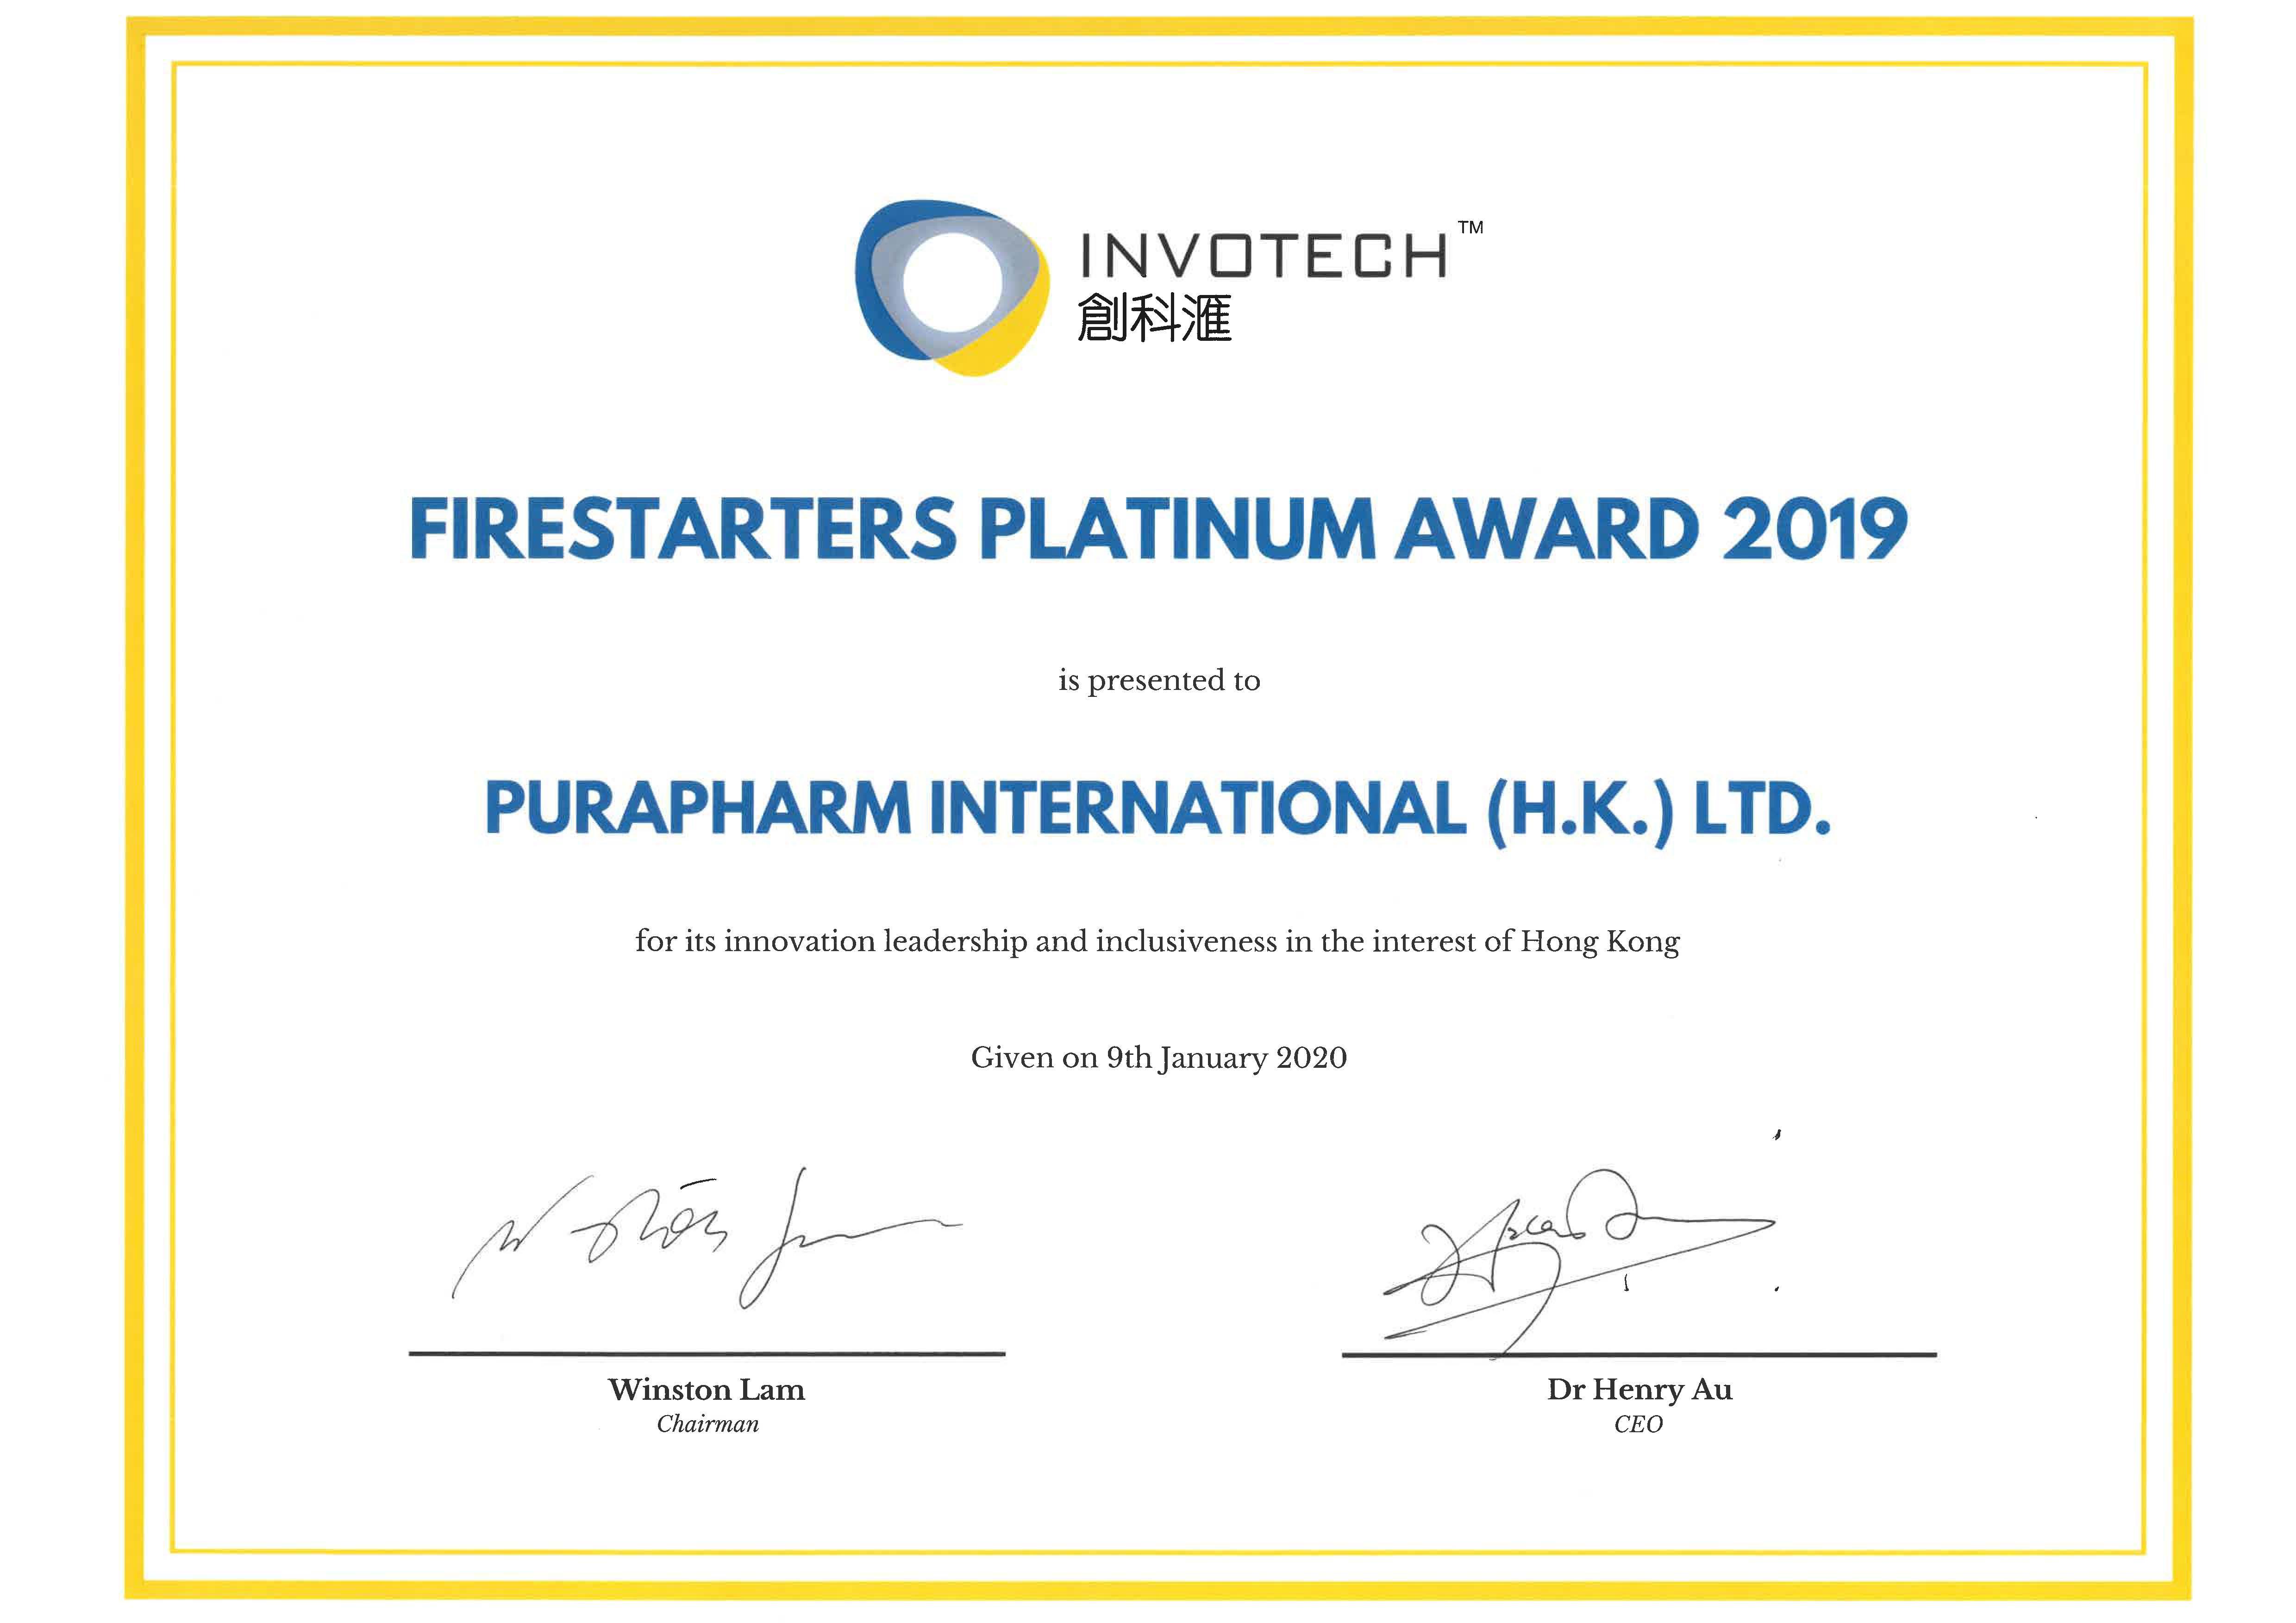 2020-01-09 Firestarters Platinum Innovation Award 2019 - certificate